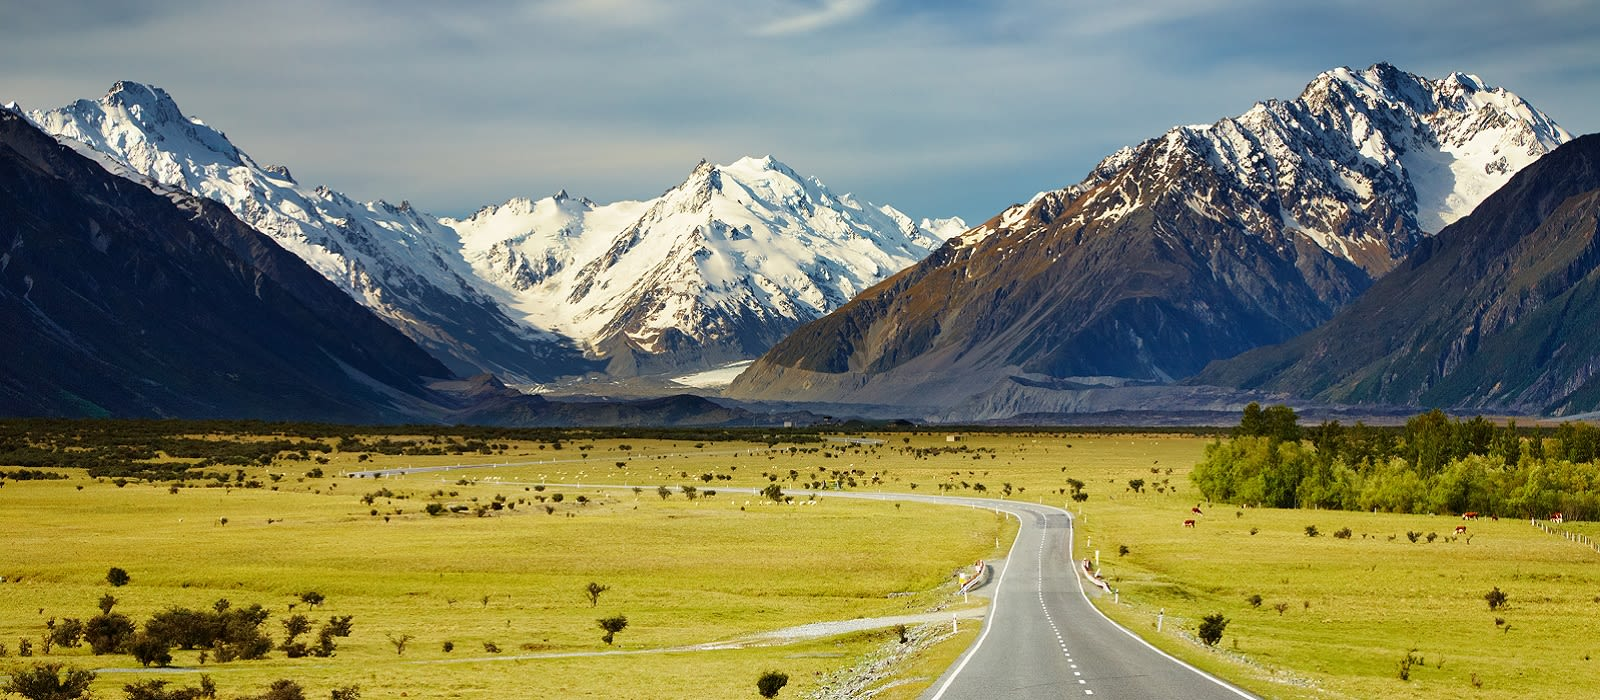 New Zealand: Landscapes, Culture and Beach Tour Trip 6